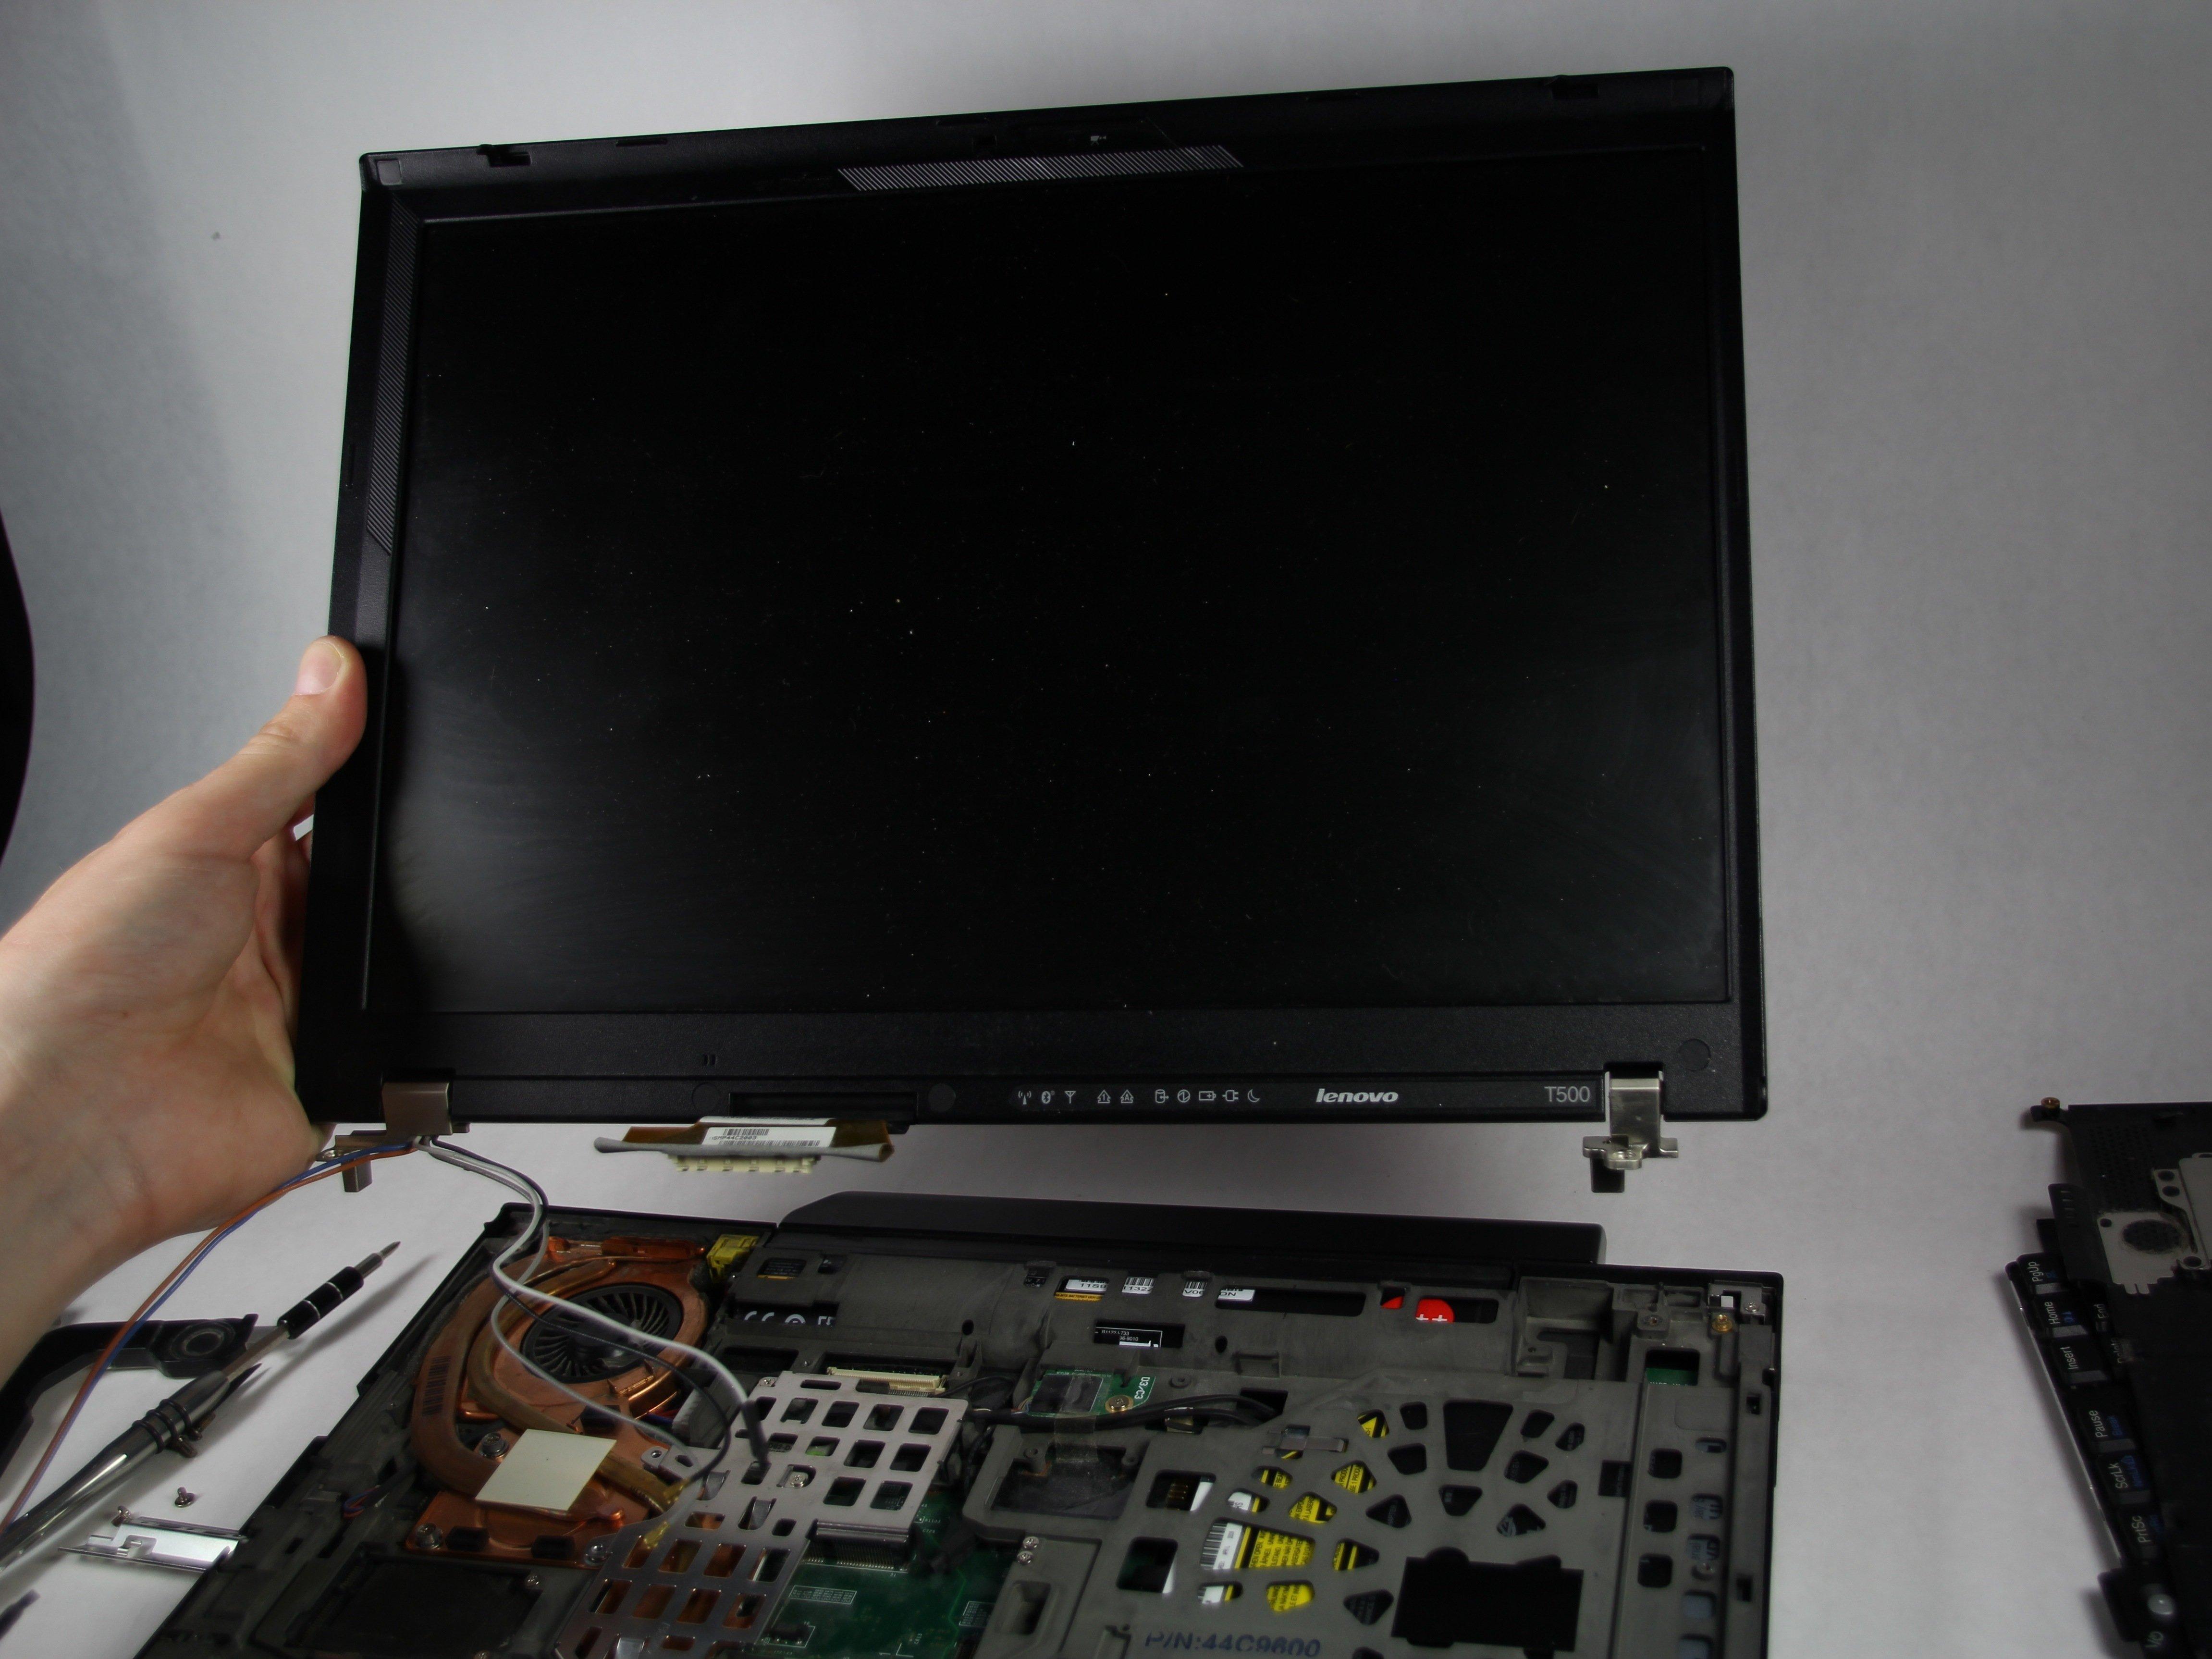 Lenovo thinkpad t500 laptop download instruction manual pdf.